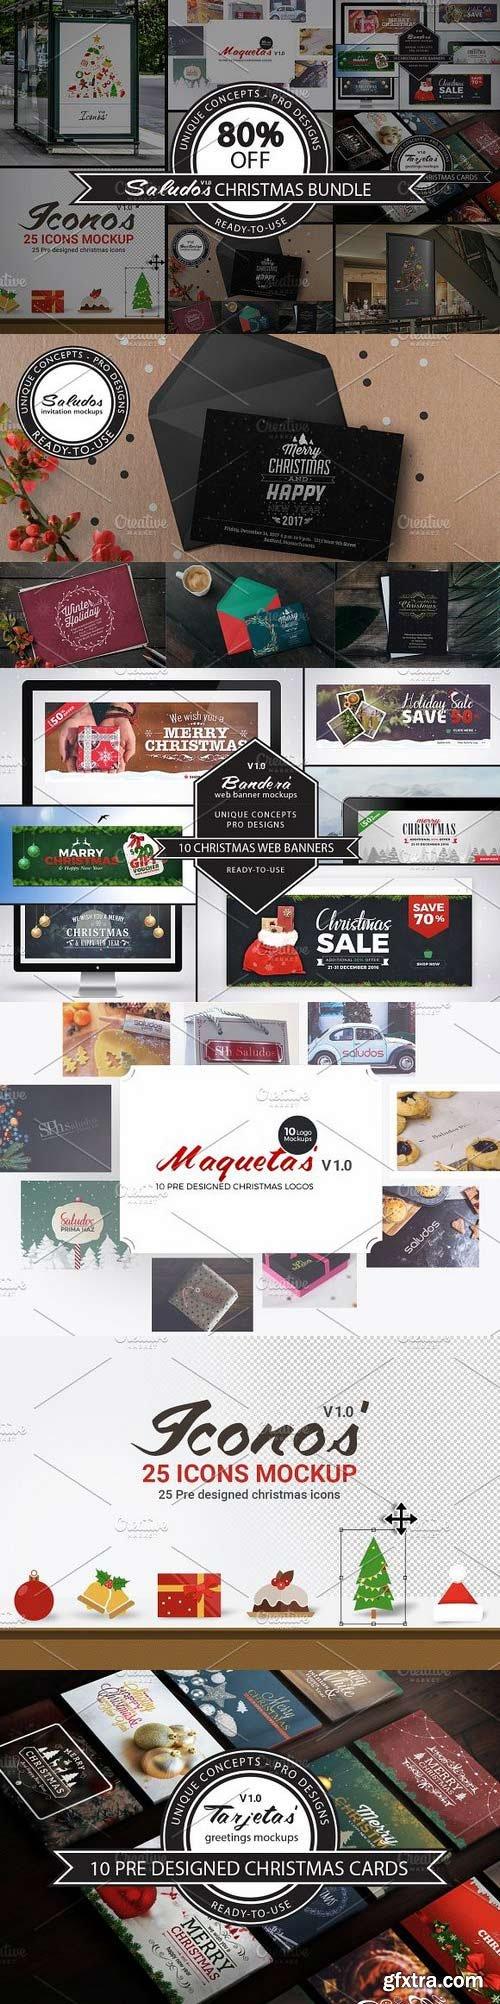 CM - Saludos' (Christmas Mega Bundle) 1125696